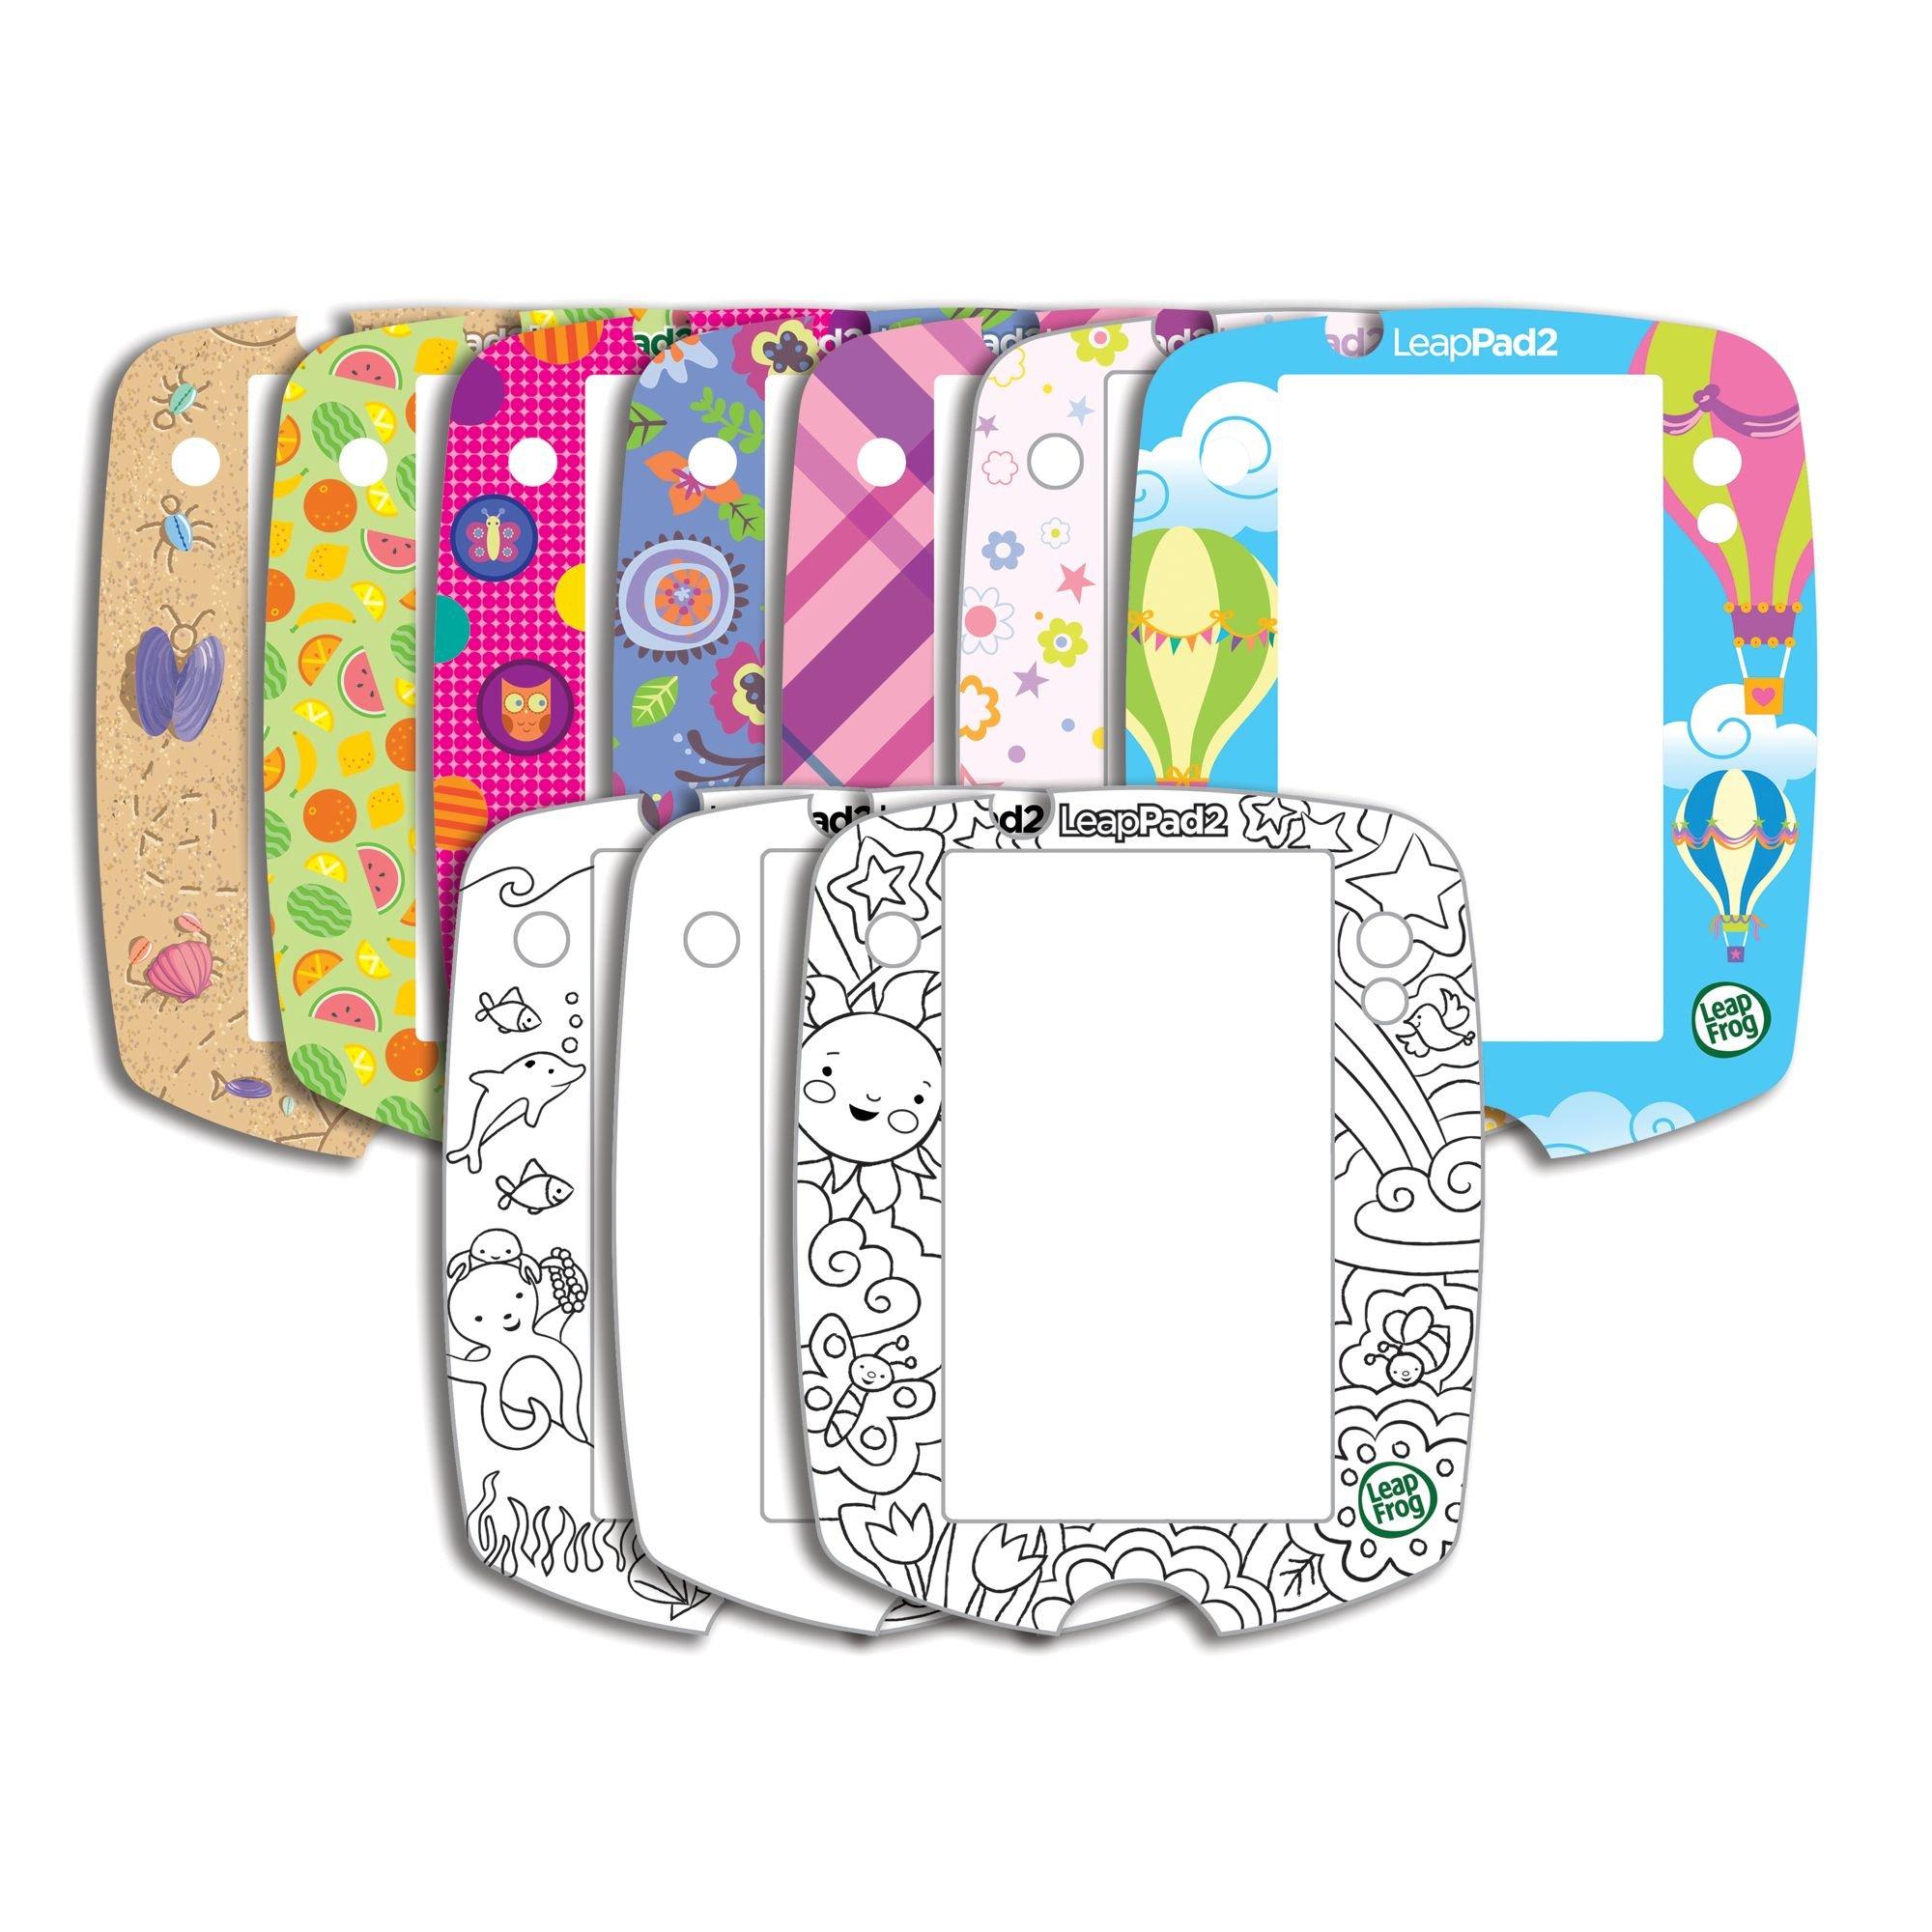 LeapFrog LeapPad2 Kids' Learning Tablet (Custom Edition), Pink by LeapFrog (Image #6)